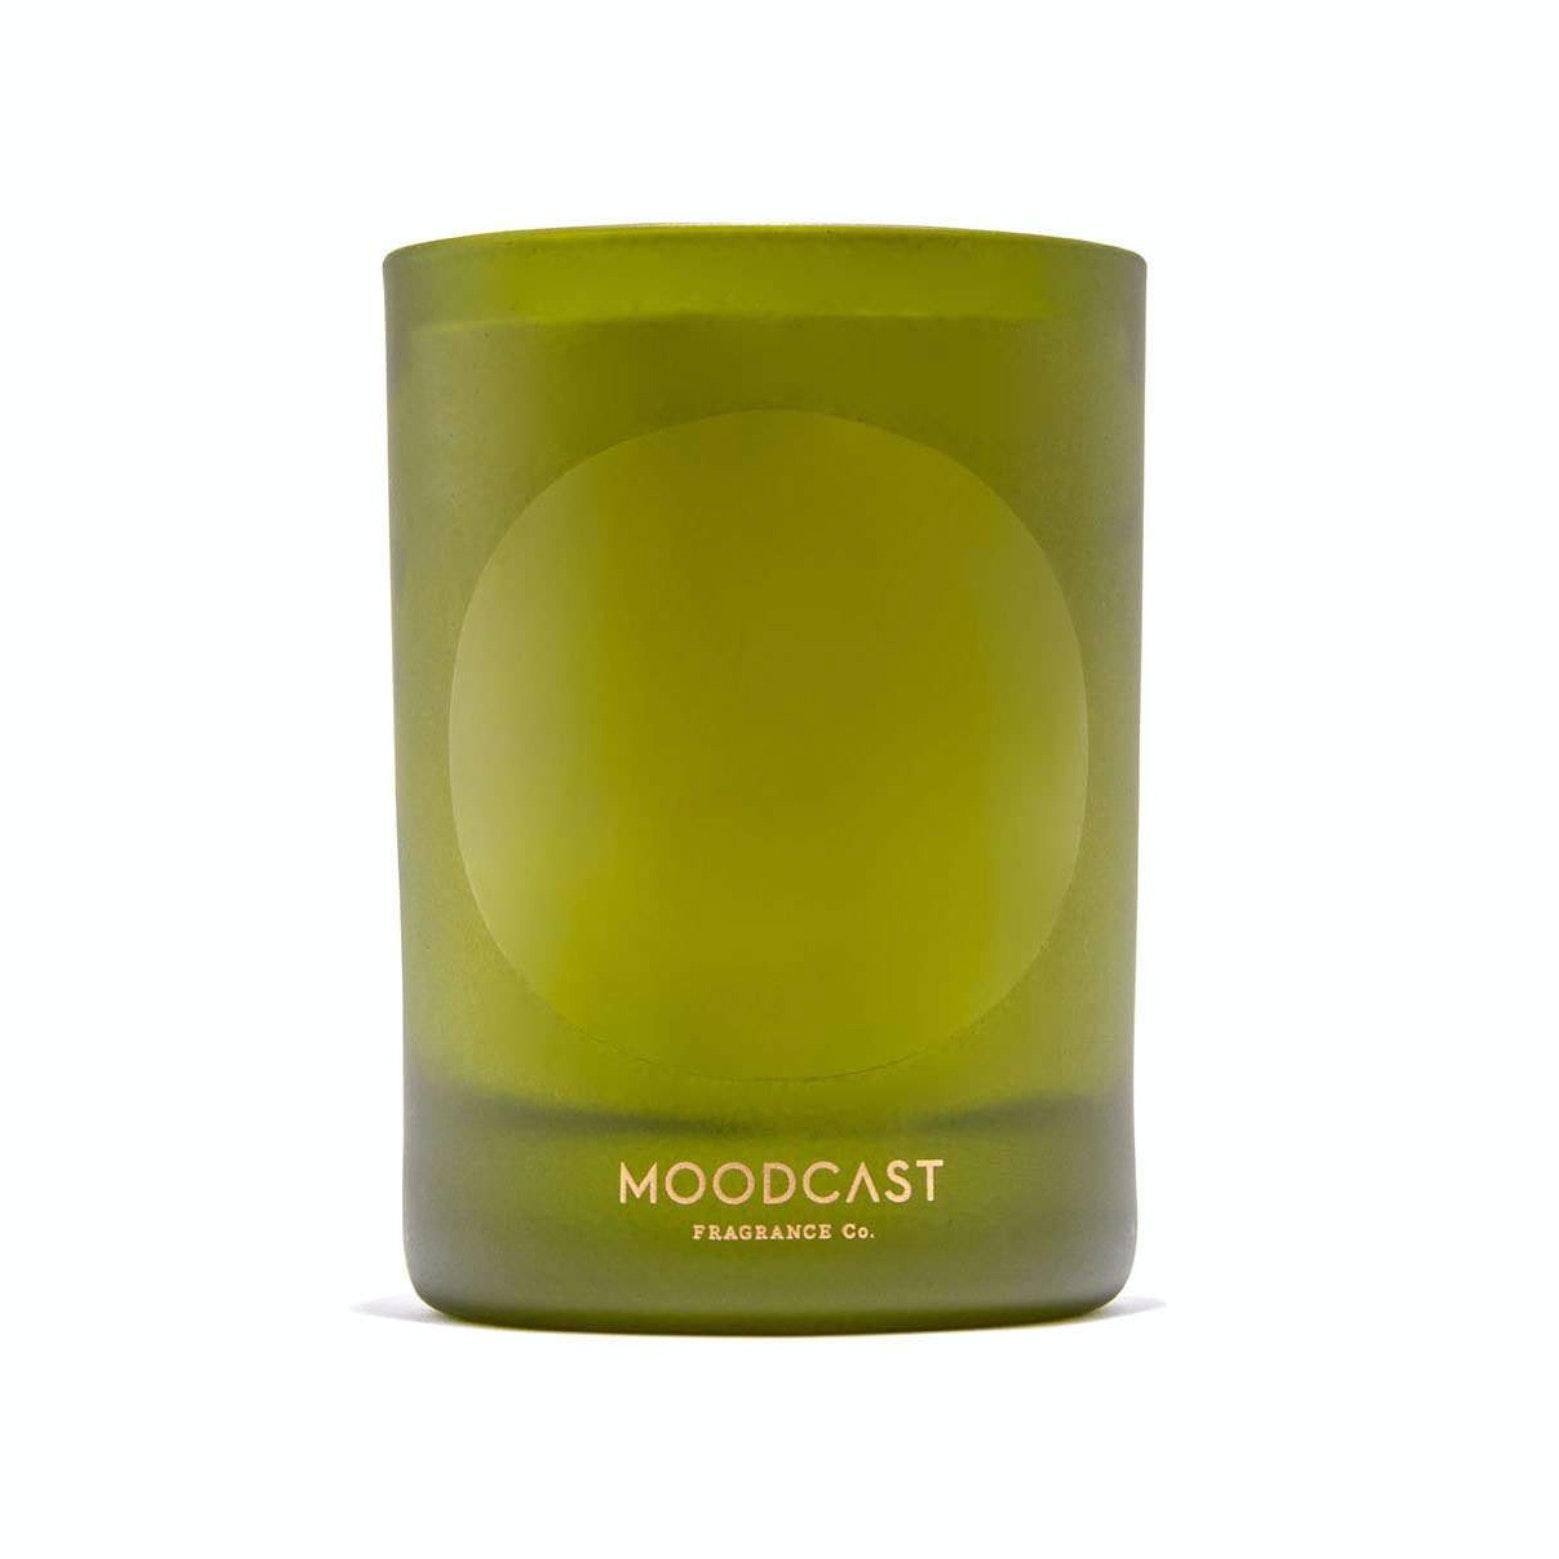 Moodcast Fragrance Co. Reveler Candle